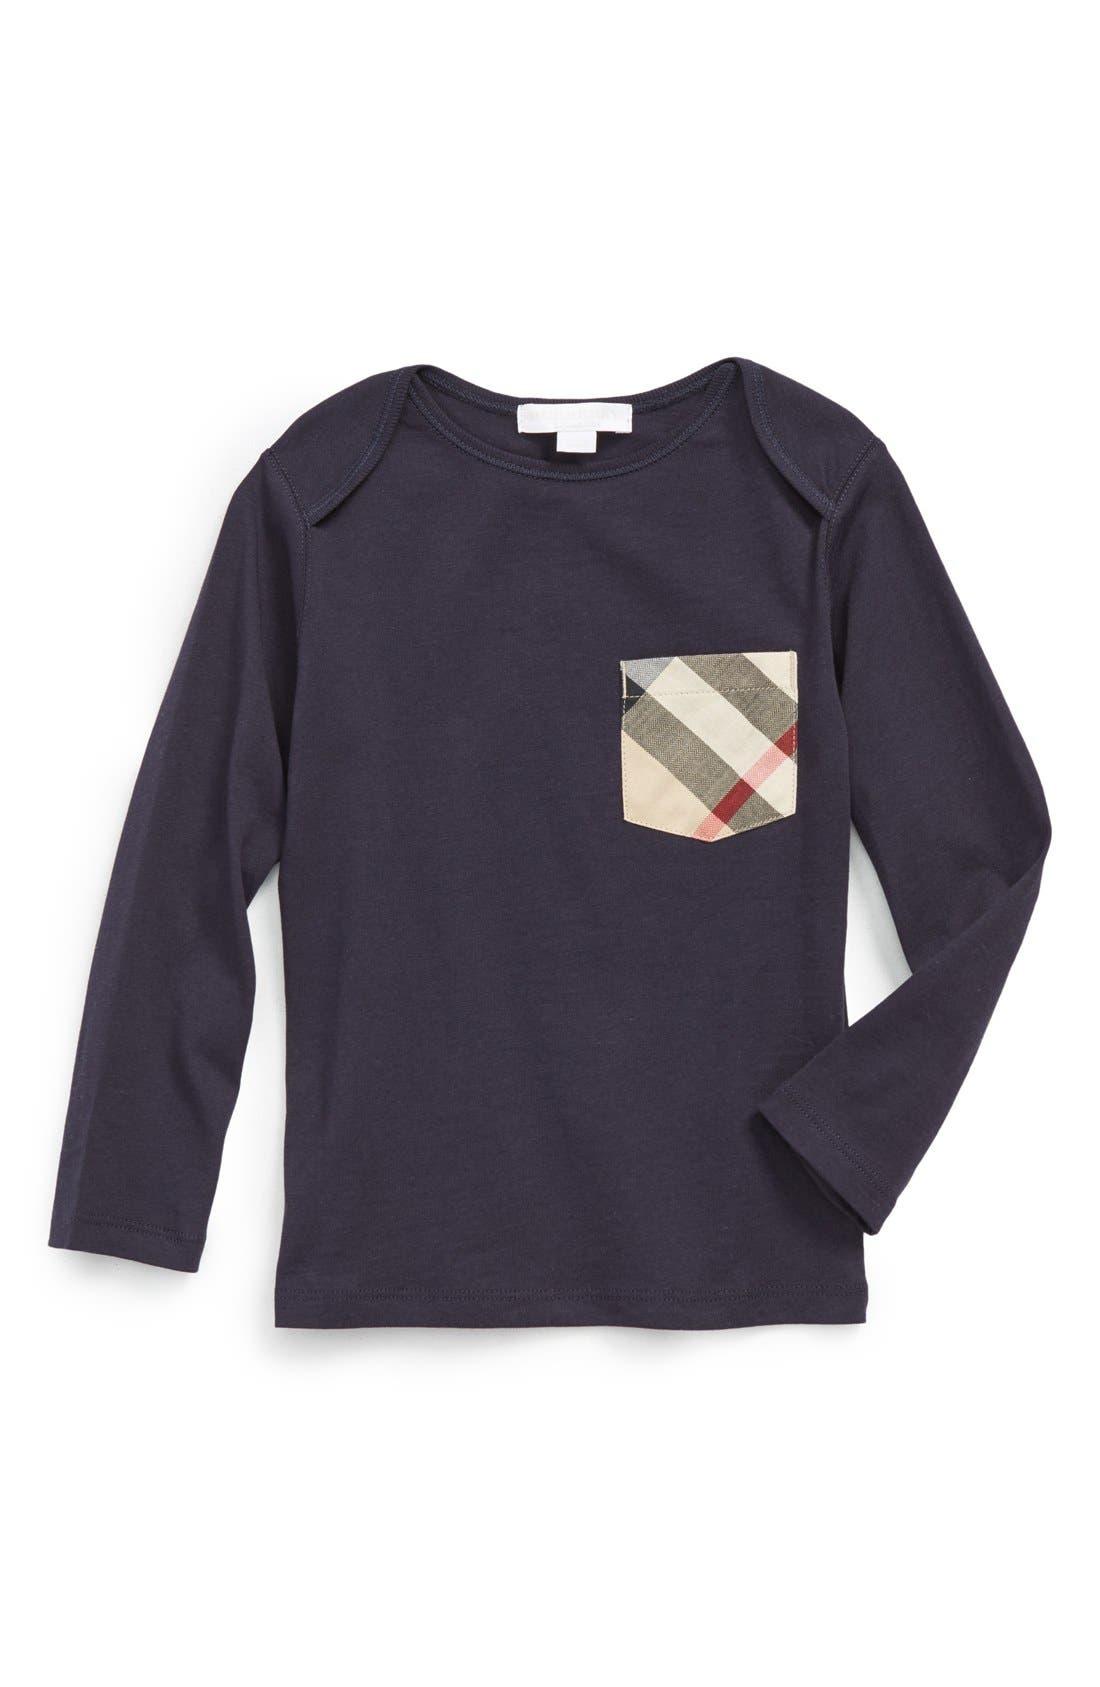 Alternate Image 1 Selected - Burberry 'Callum' Check Print Chest Pocket T-Shirt (Baby Boys)